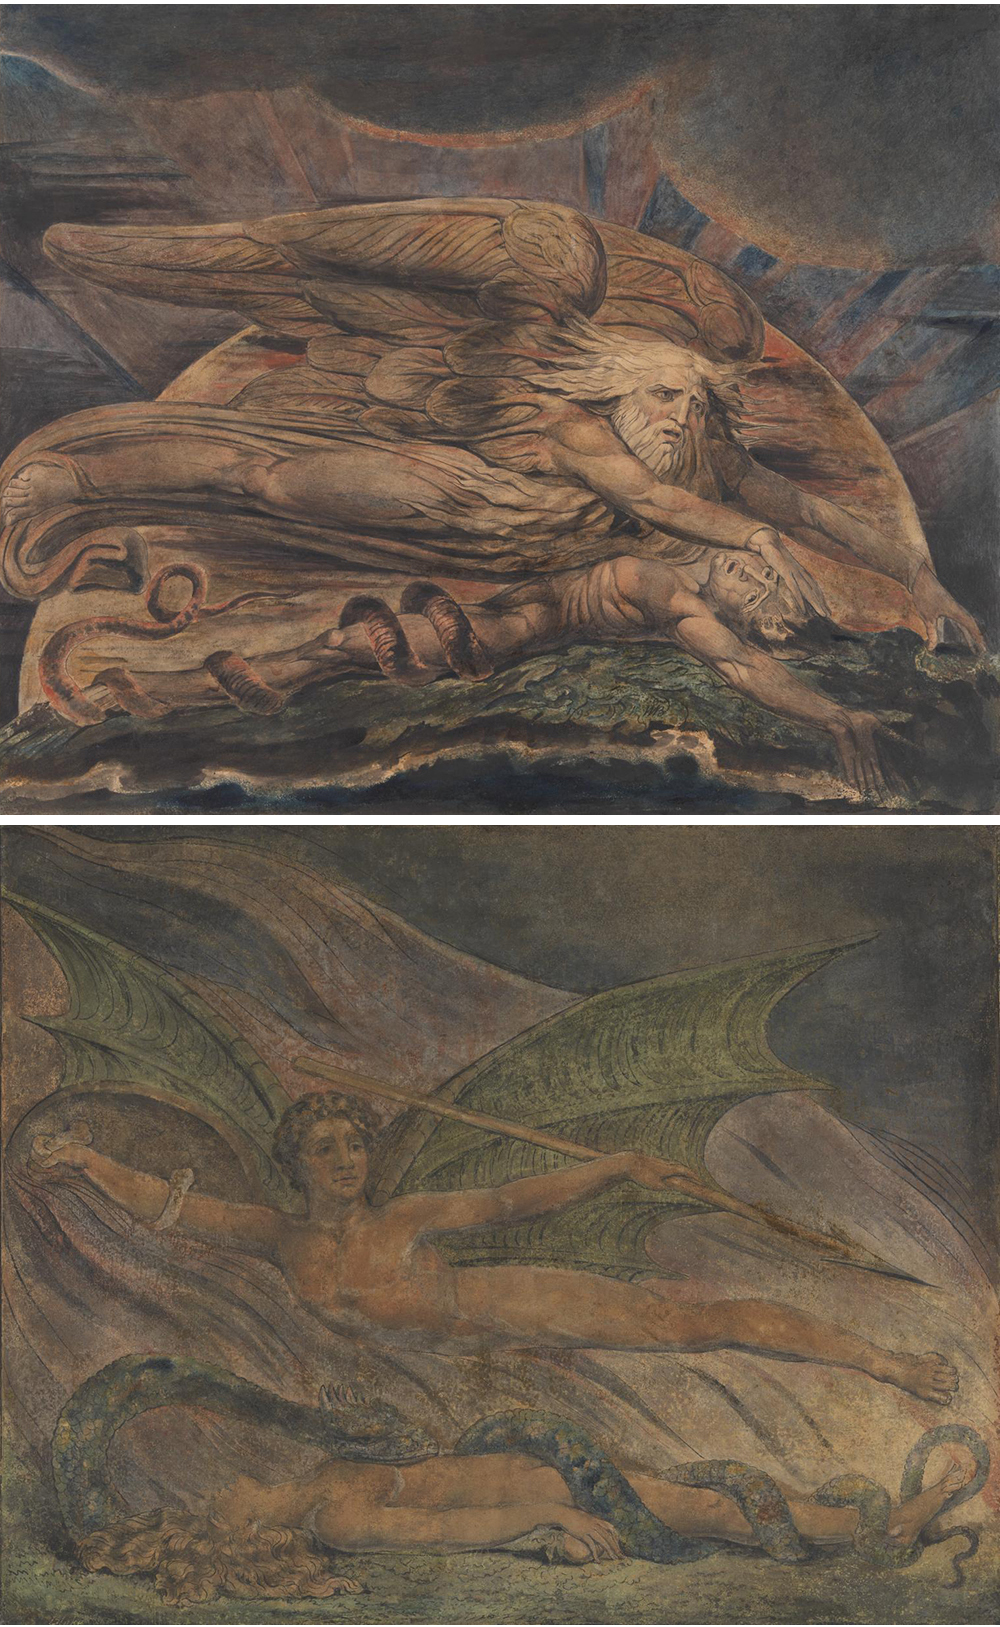 Top: Elohim Creating Adam, by William Blake, c. 1795. Bottom: Satan Exulting over Eve, by William Blake, c. 1795.